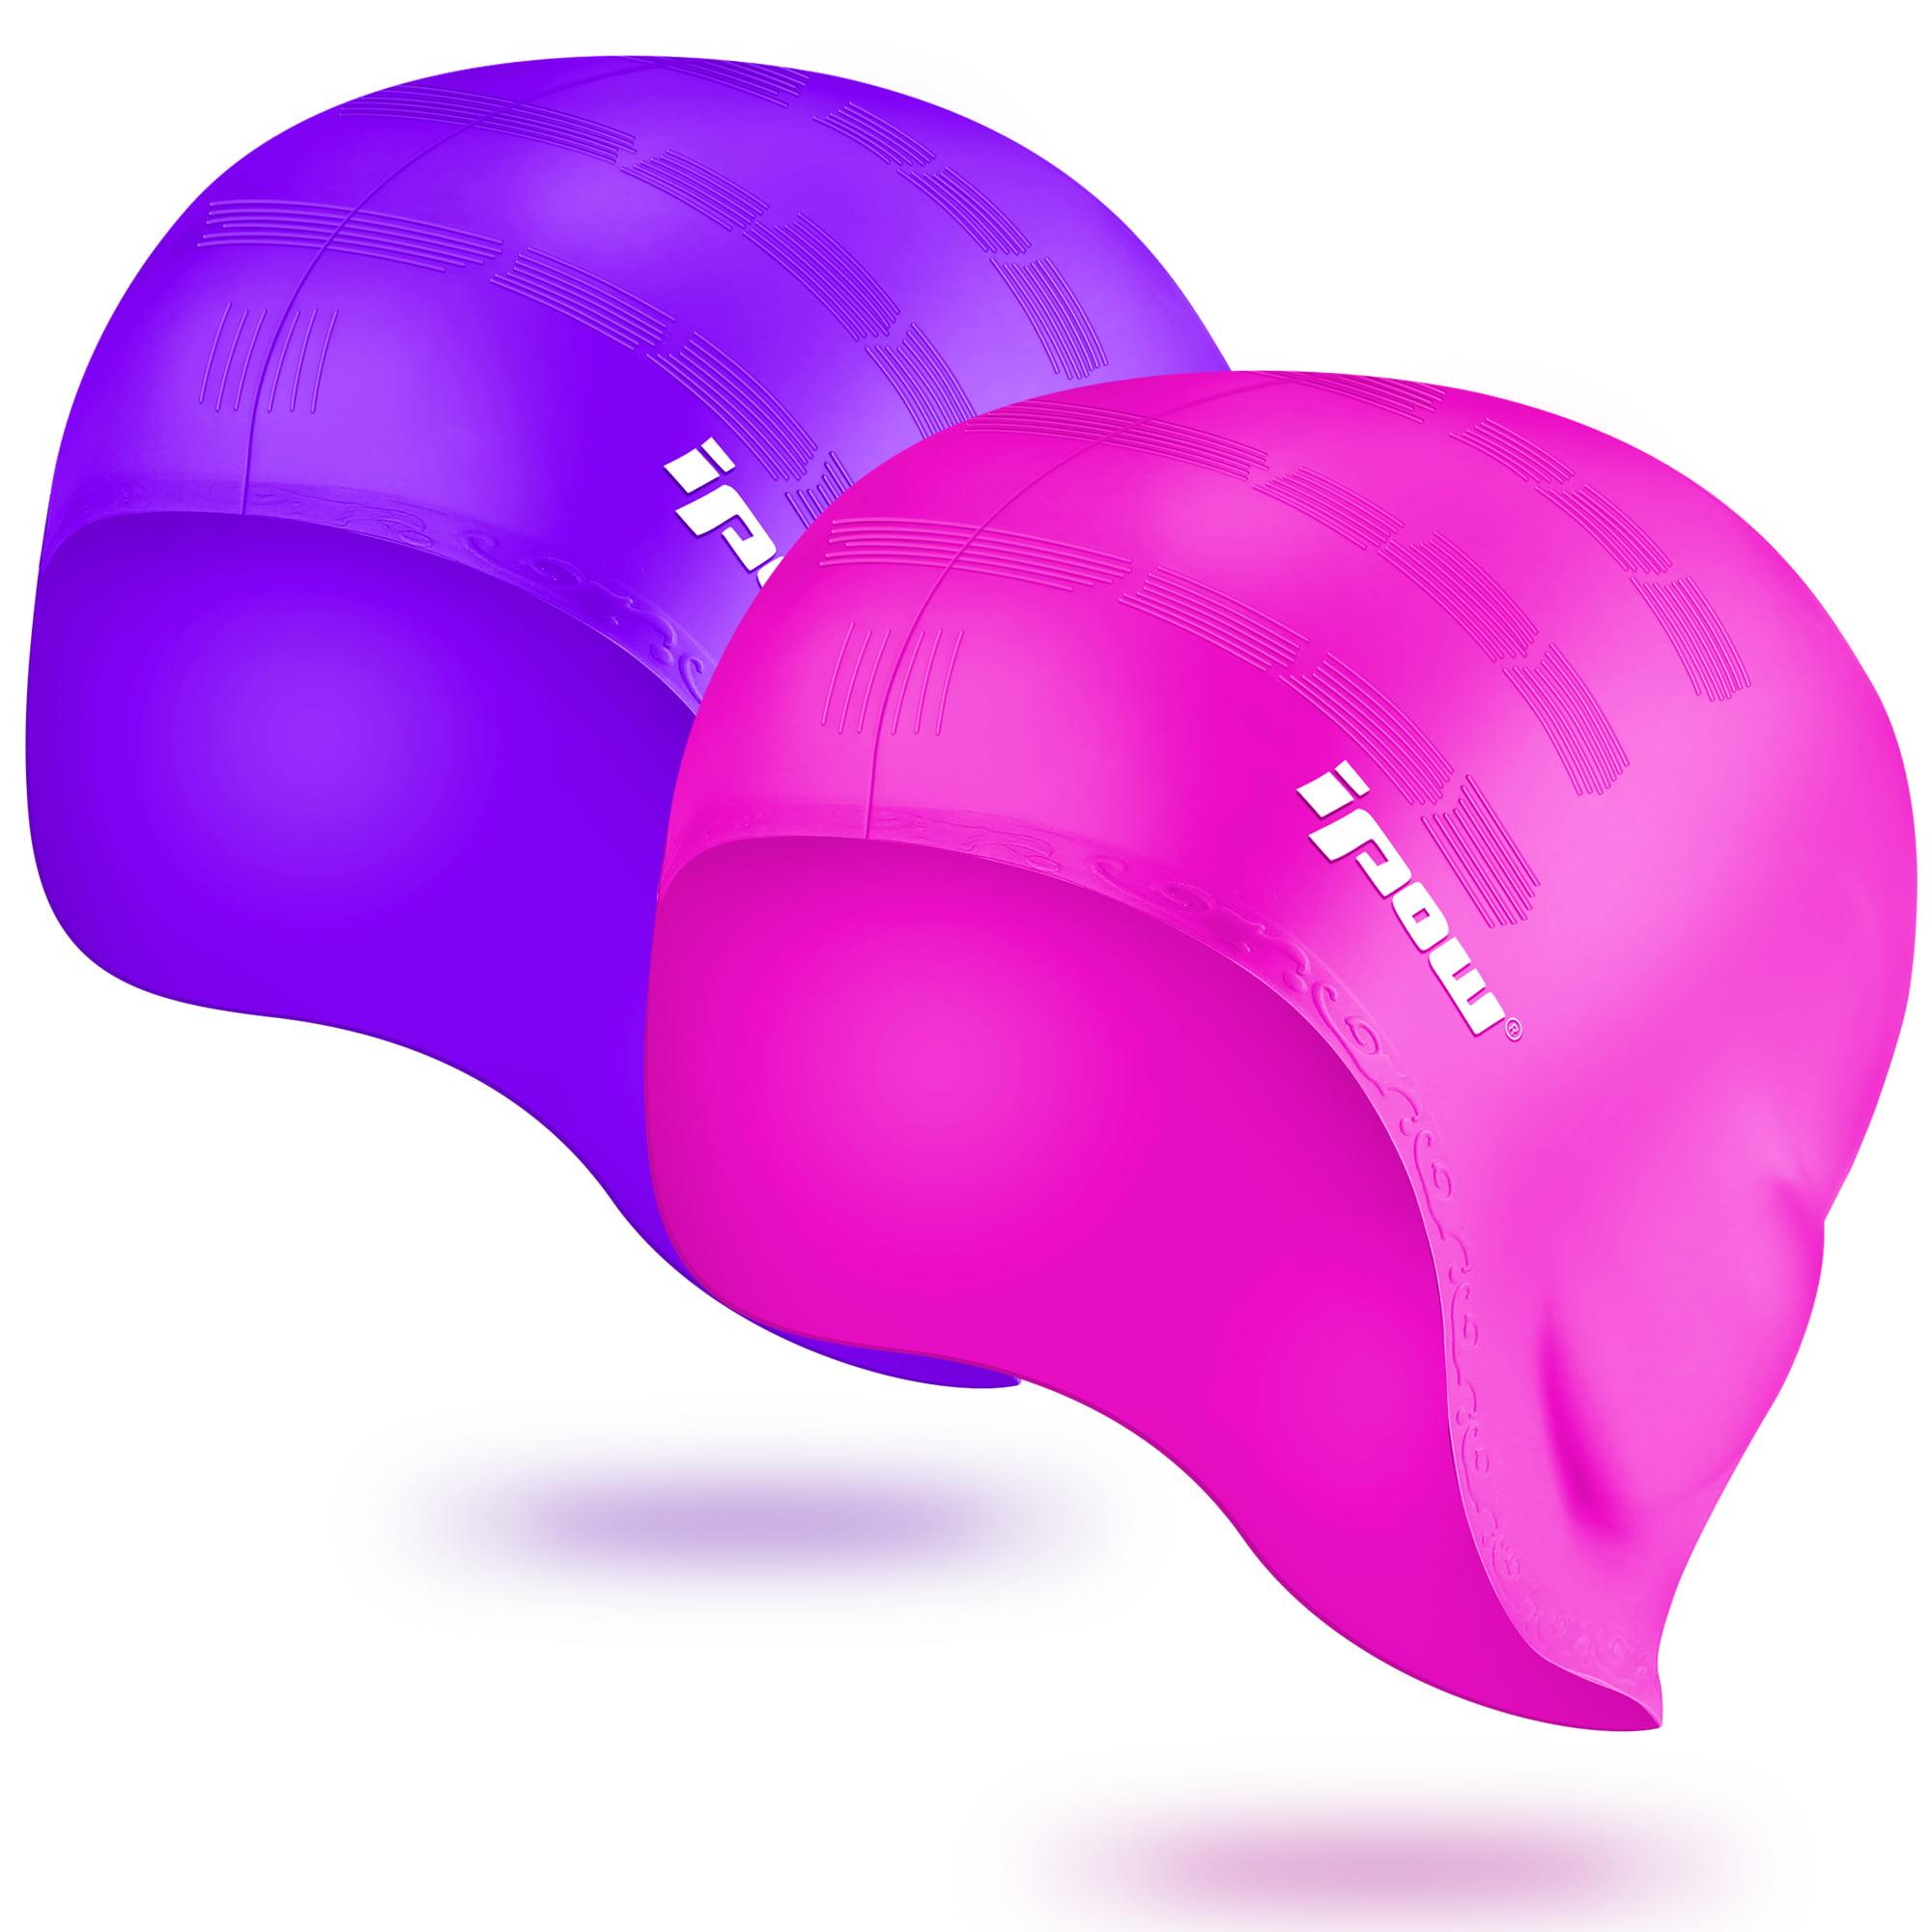 2-Pack Silicone Swim Caps, IPOW Waterproof Swimming Cap Hat Swim Caps for Women Men Adults Long Hair Kids Girls and Boys, Purple + Rose Red